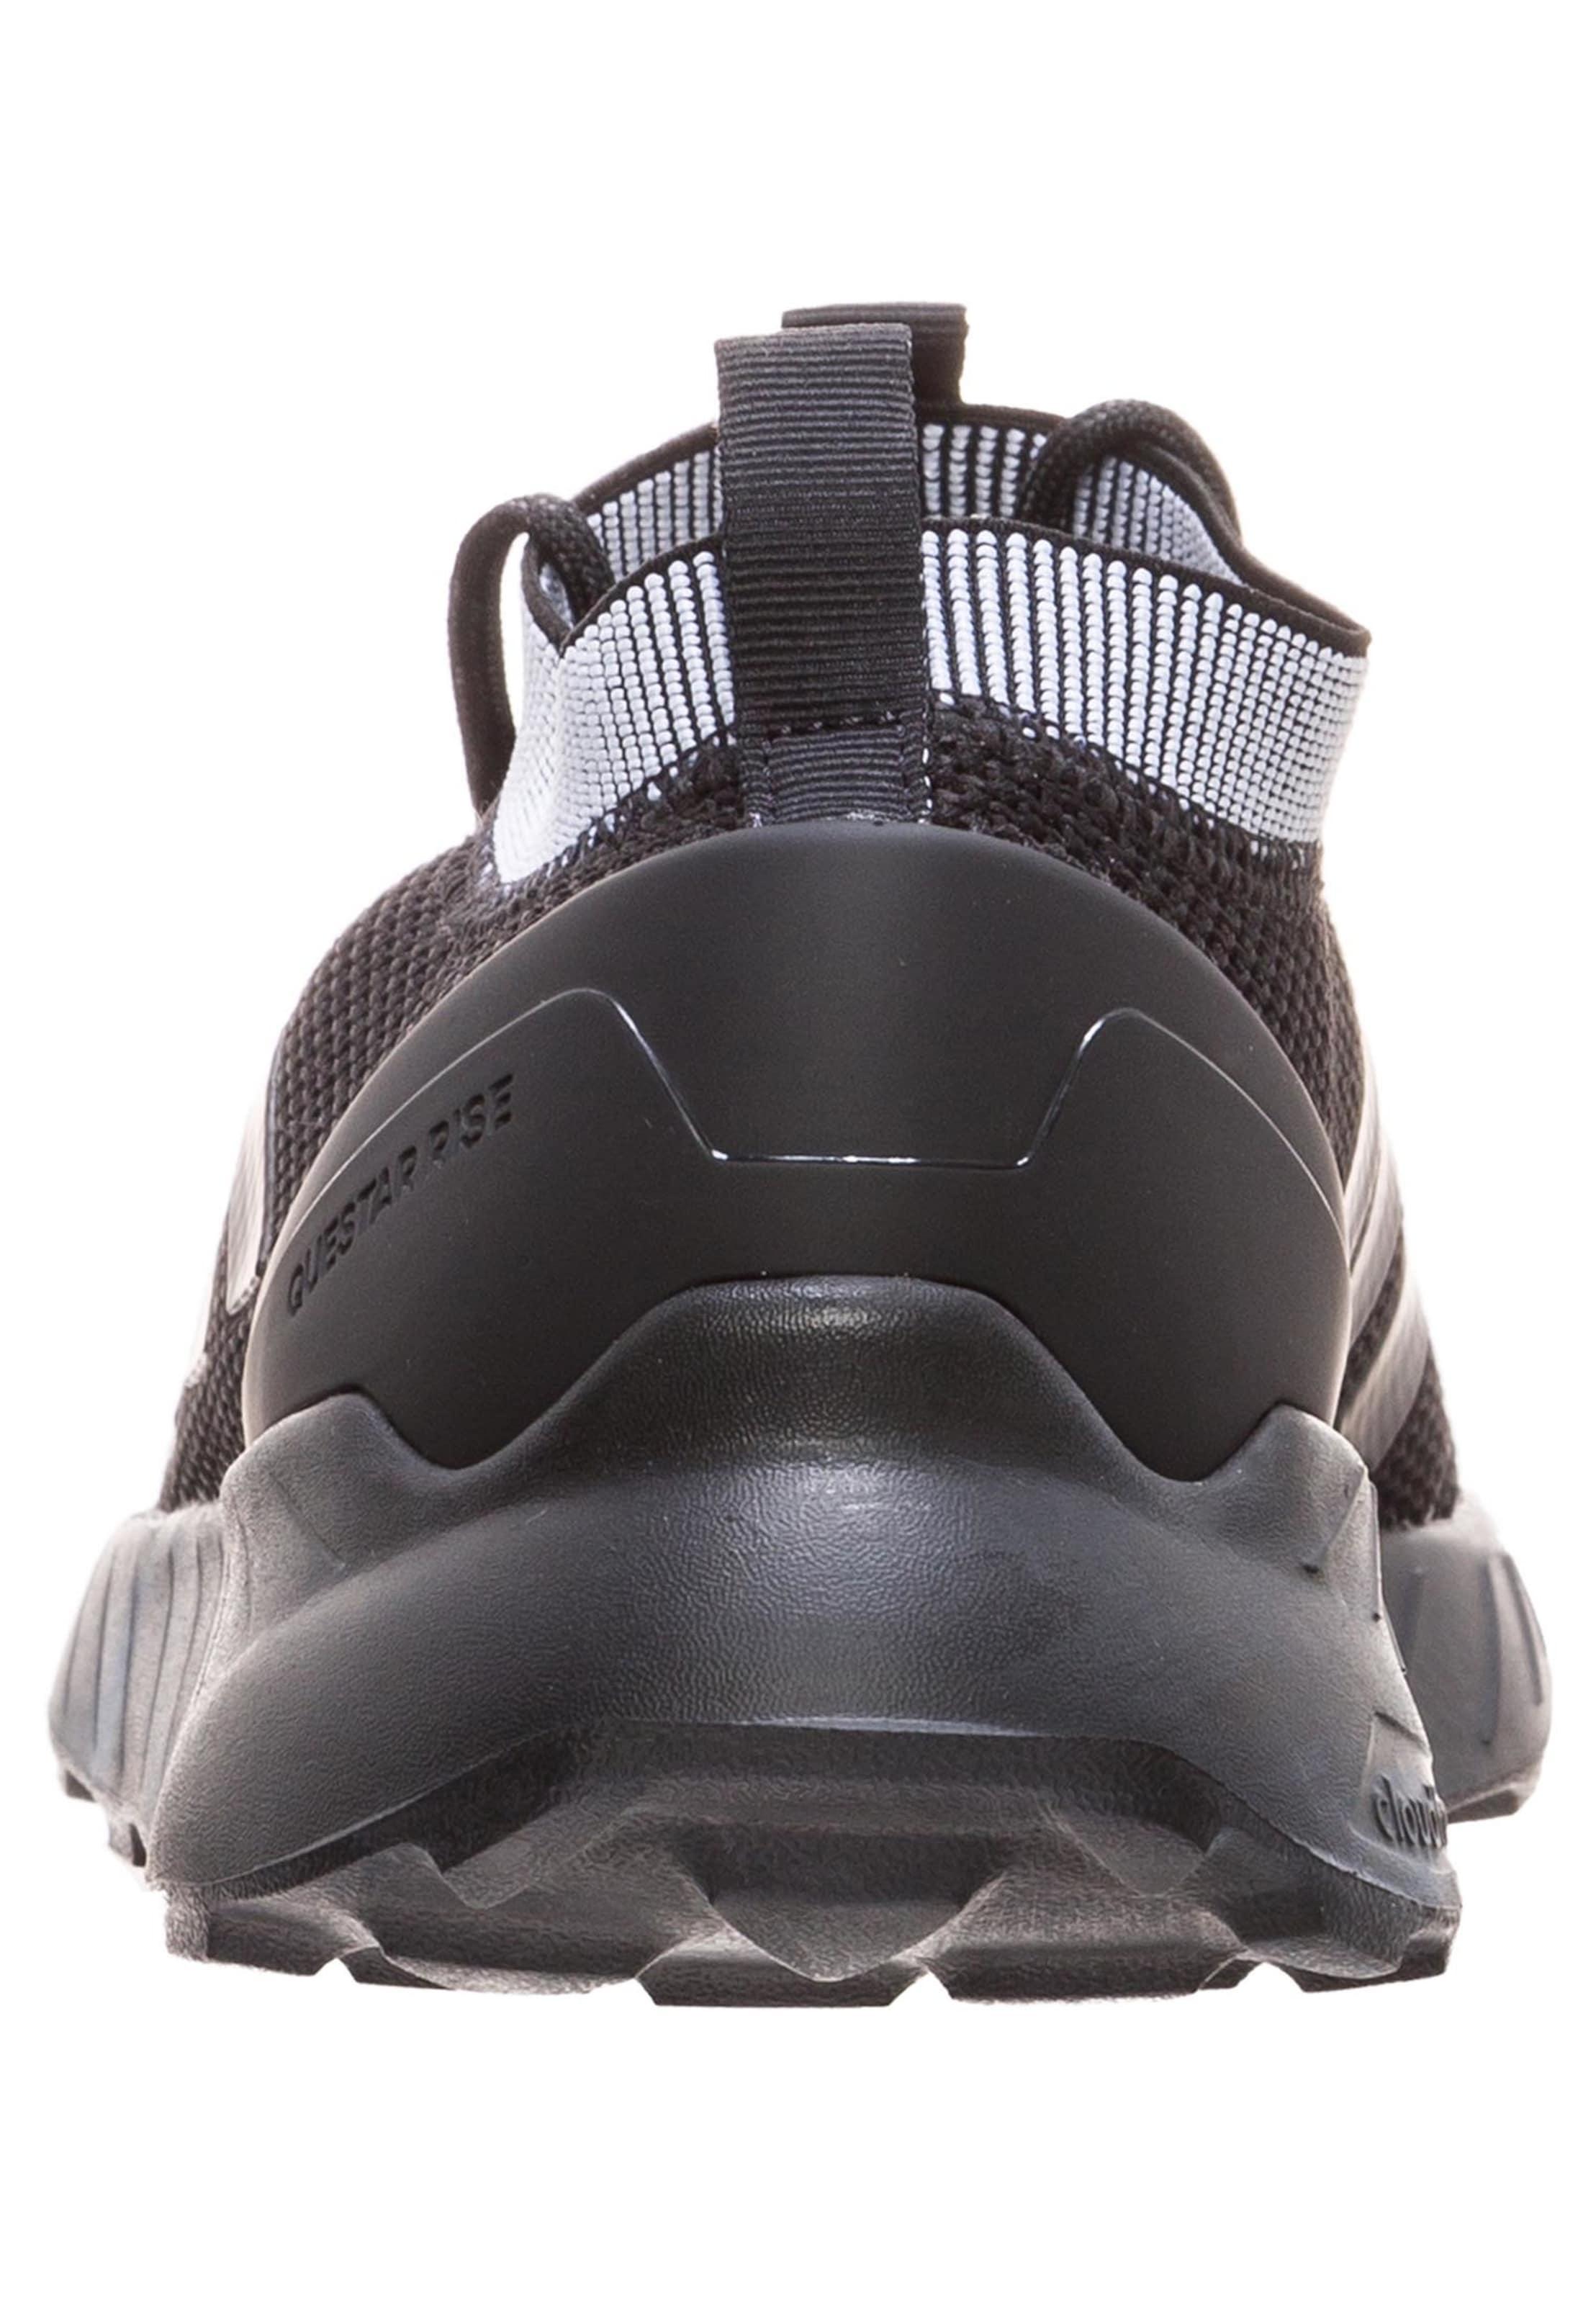 Originals 'questar' In Sneaker Adidas Schwarz lJF1cK